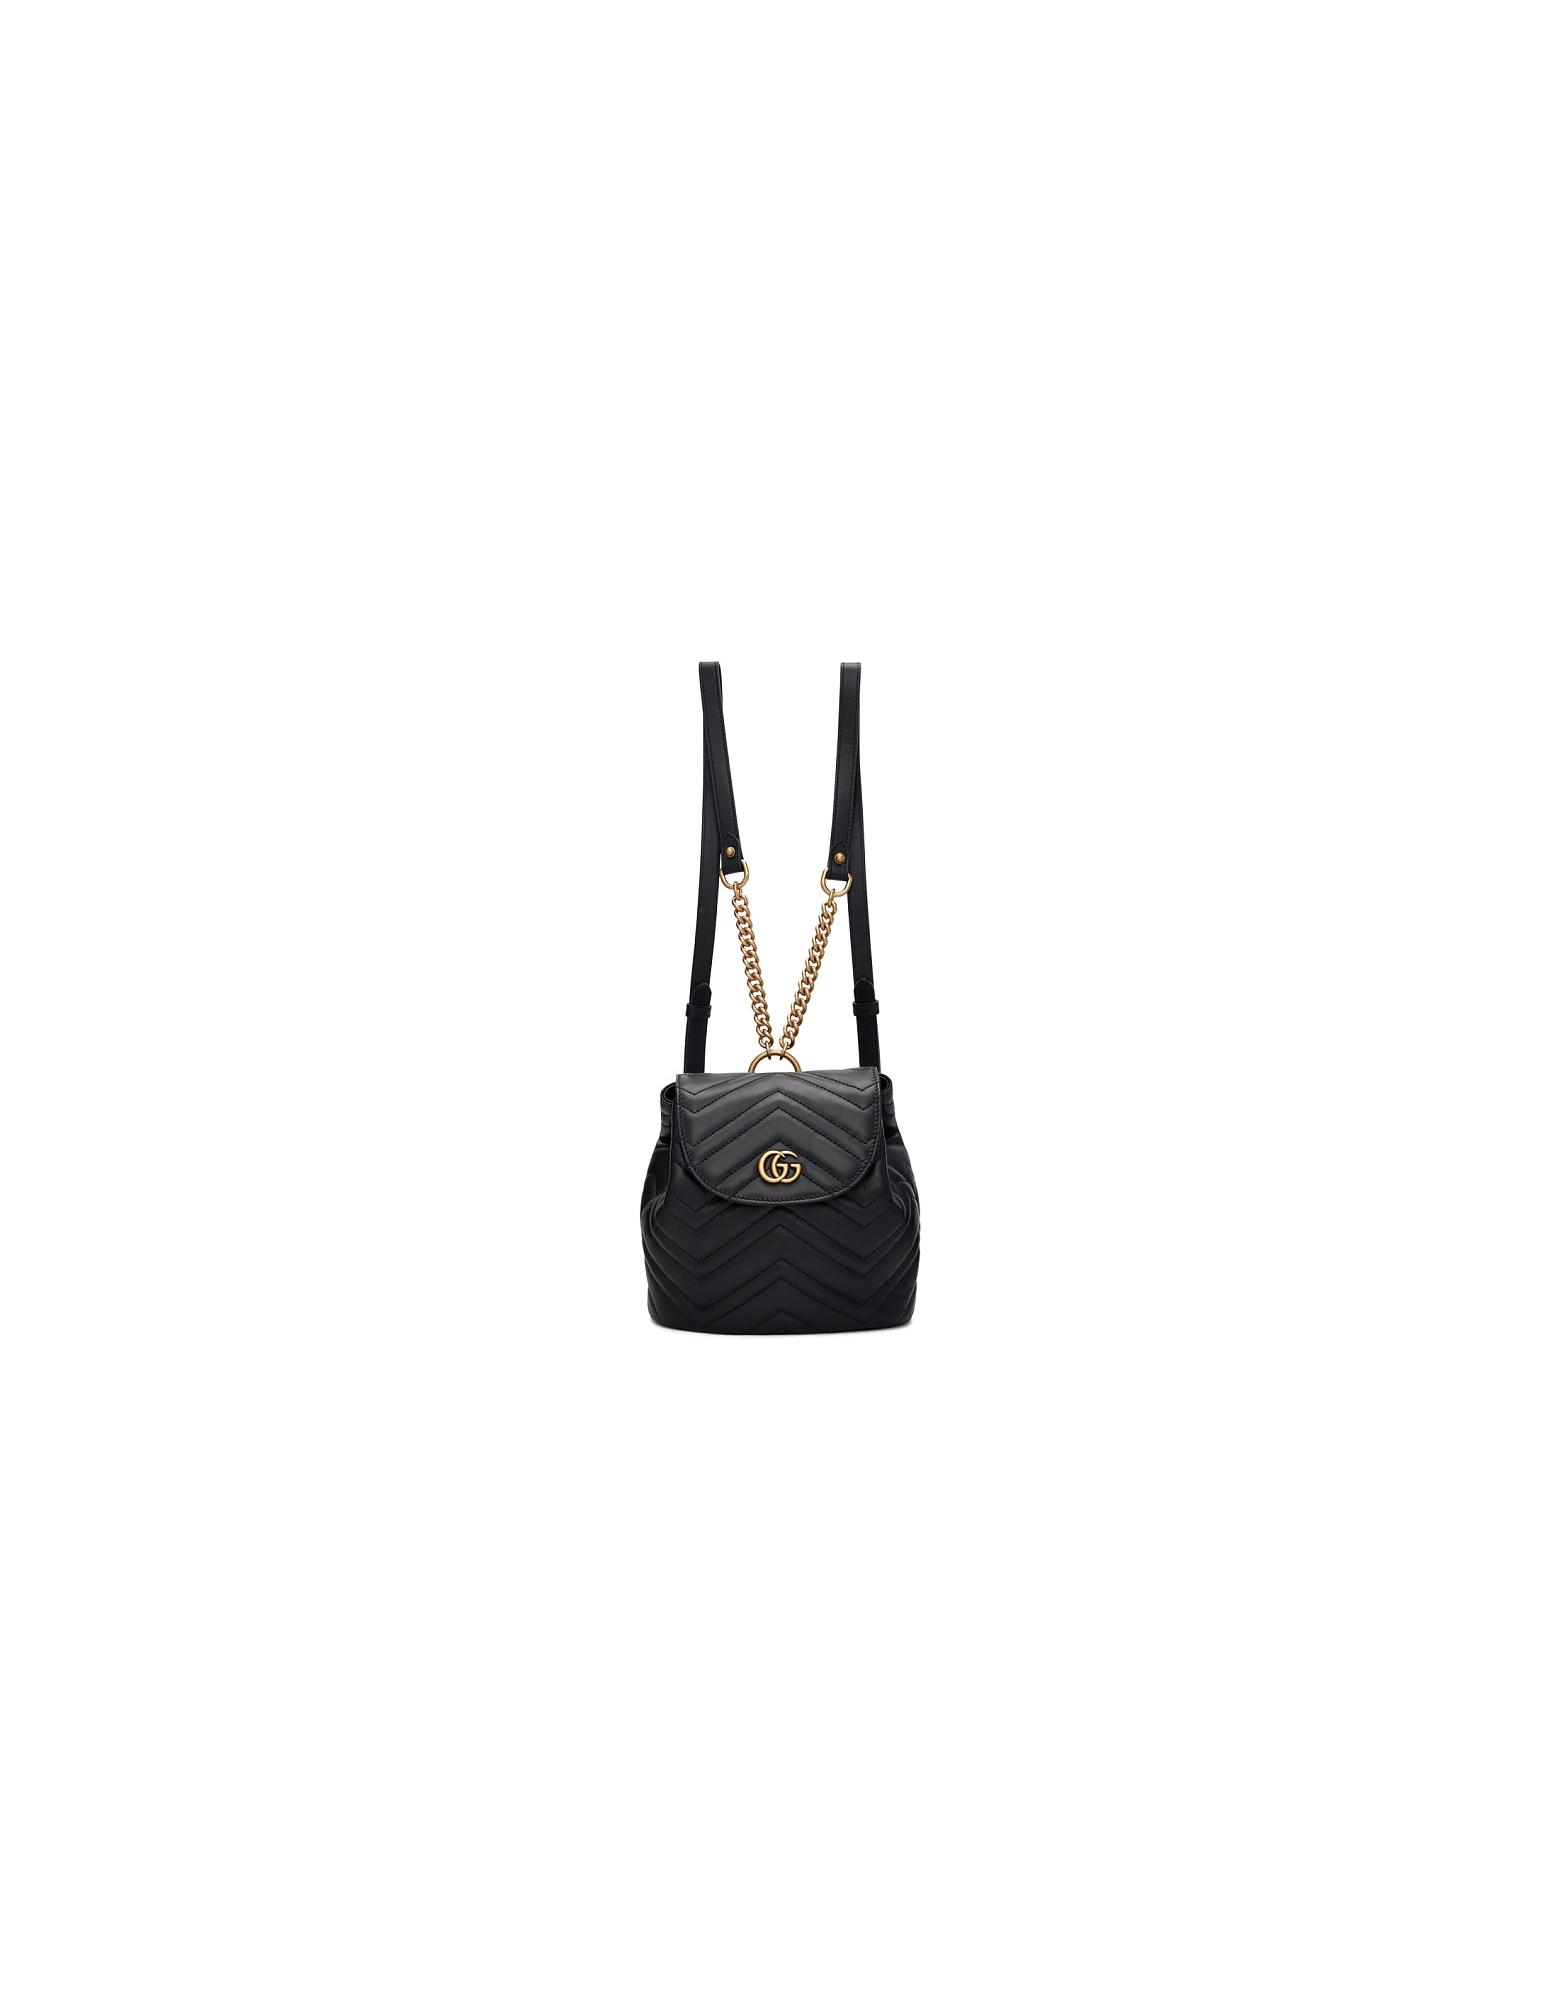 Gucci Designer Handbags, Black Mini GG Marmont 2.0 Backpack